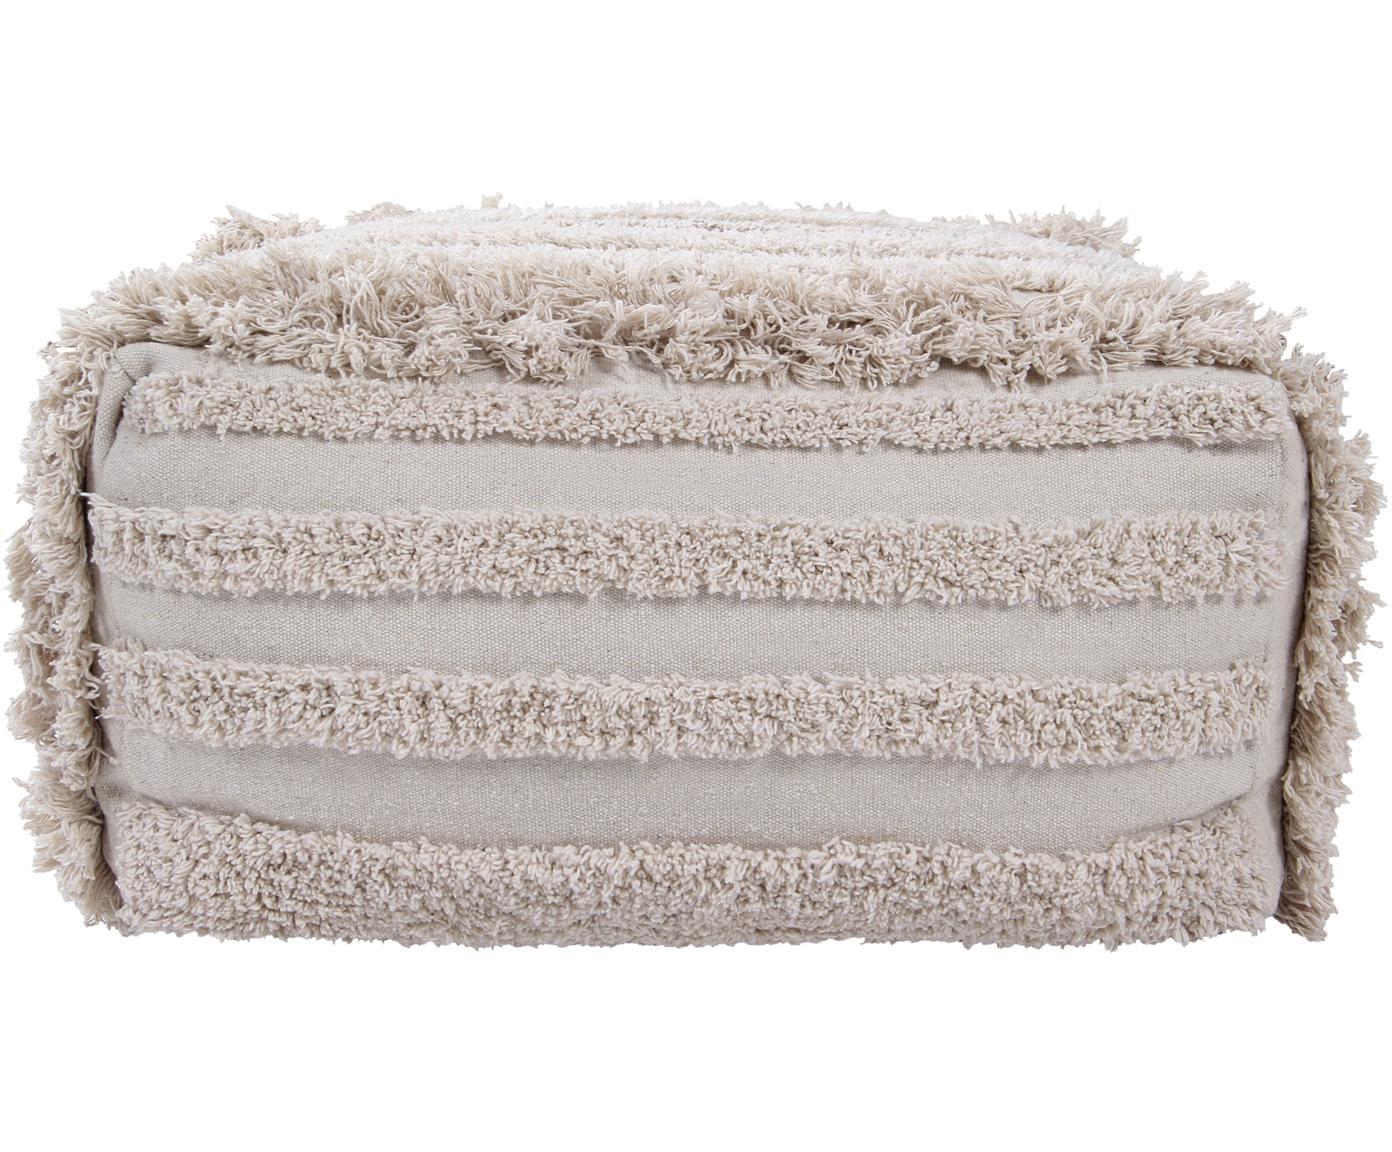 Cojín de suelo Boho Air, Funda: 90%algodón, 10%algodón , Beige, An 54 x Al 27 cm